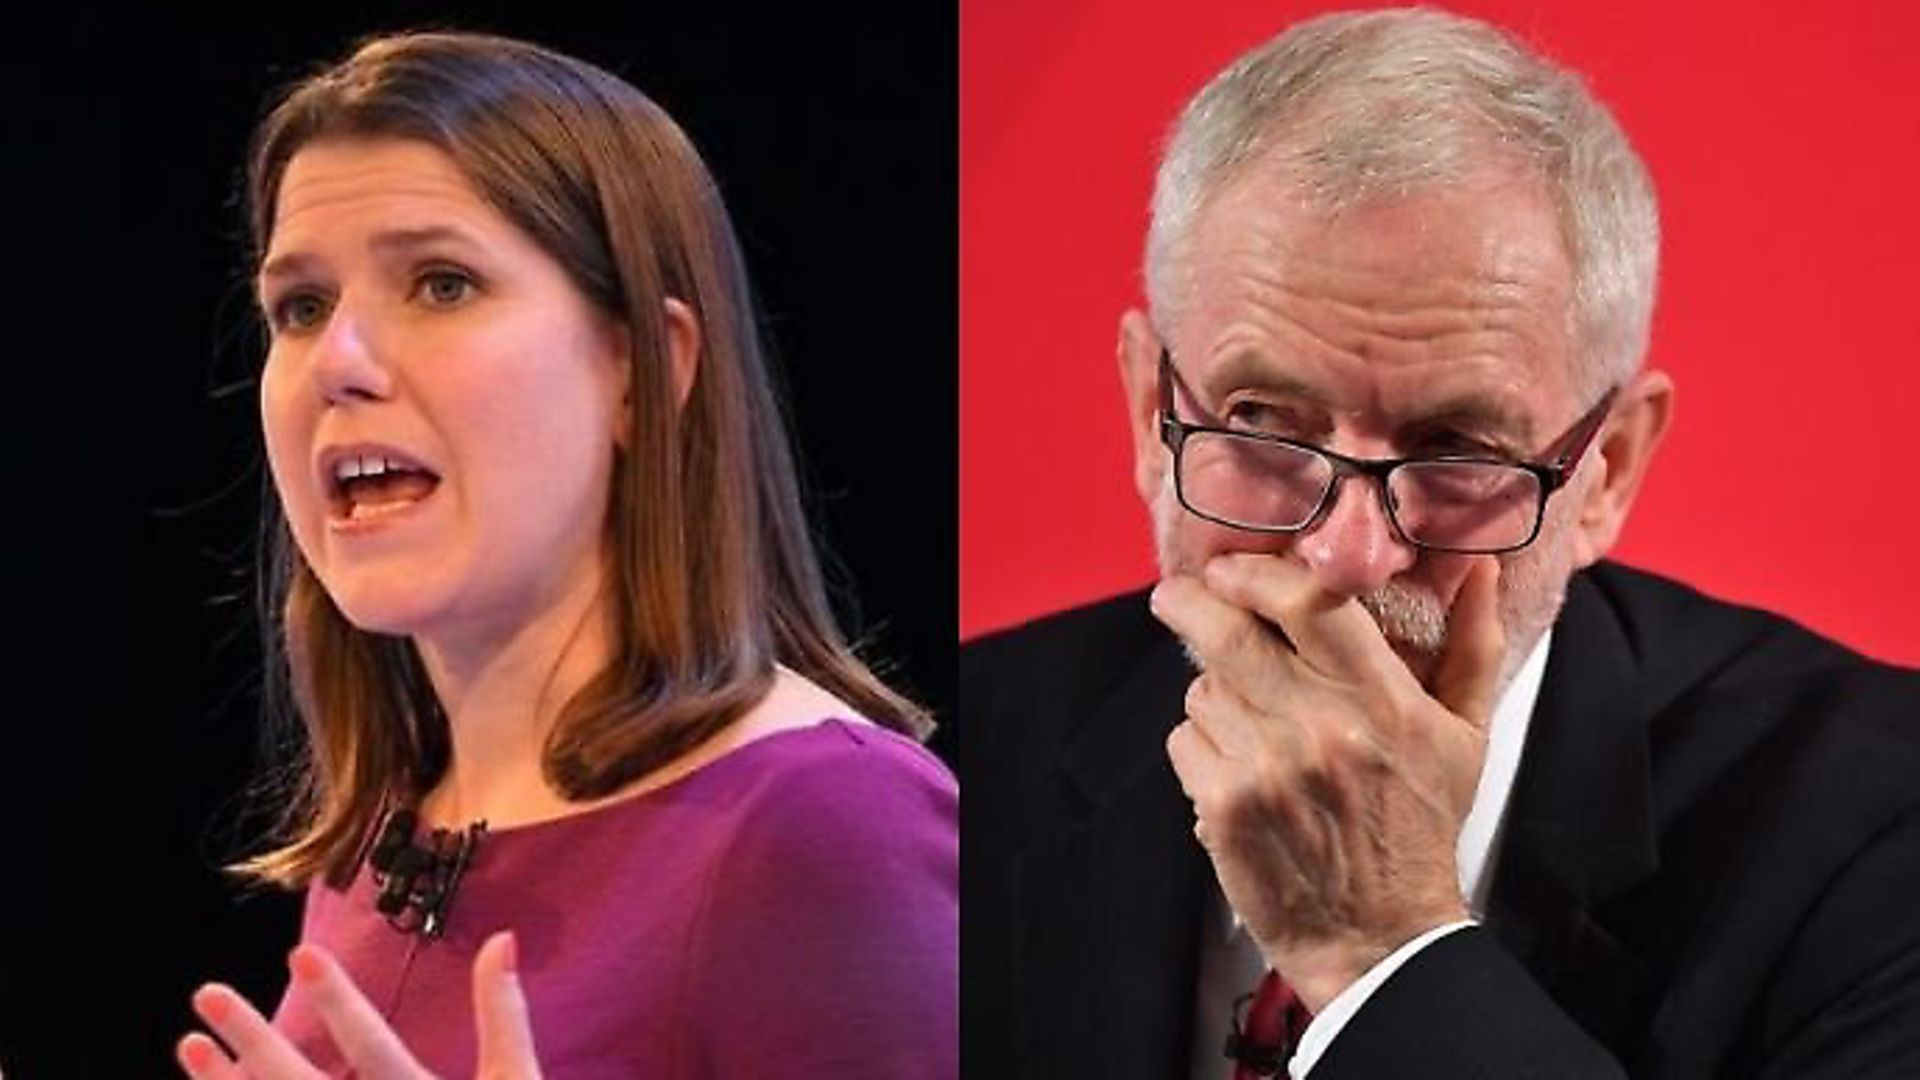 Jo Swinson and Jeremy Corbyn. Photograph: PA. - Credit: Archant